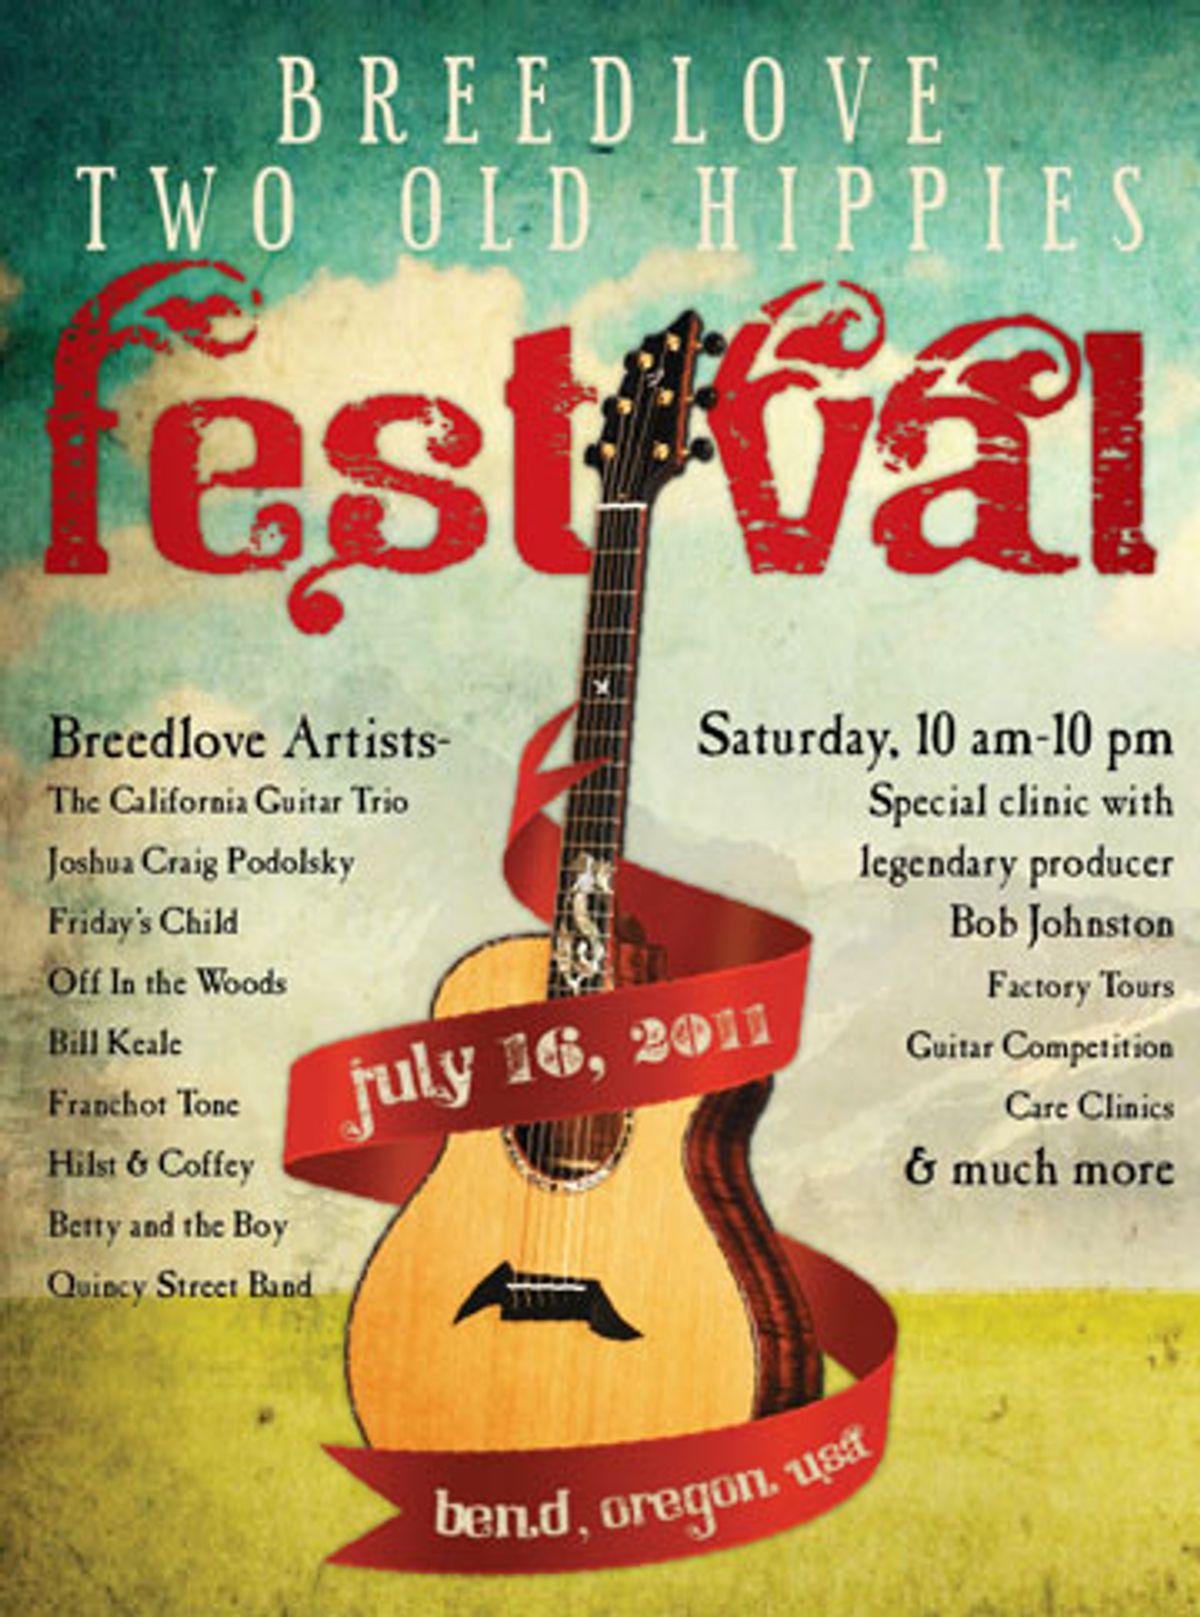 Breedlove Announces 2011 Breedlove Festival